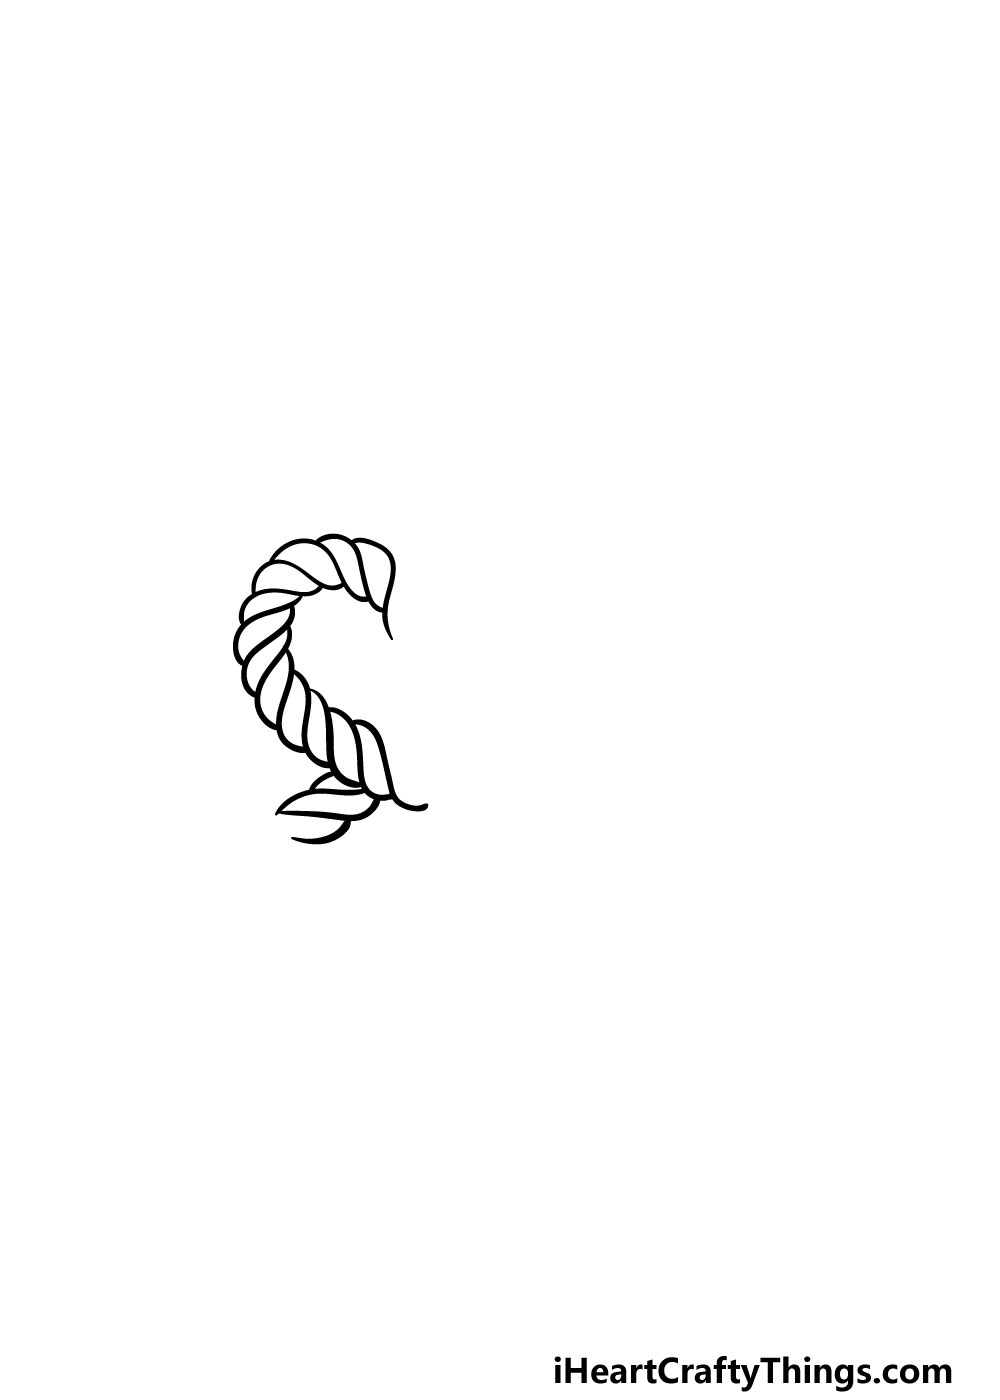 drawing rope step 2